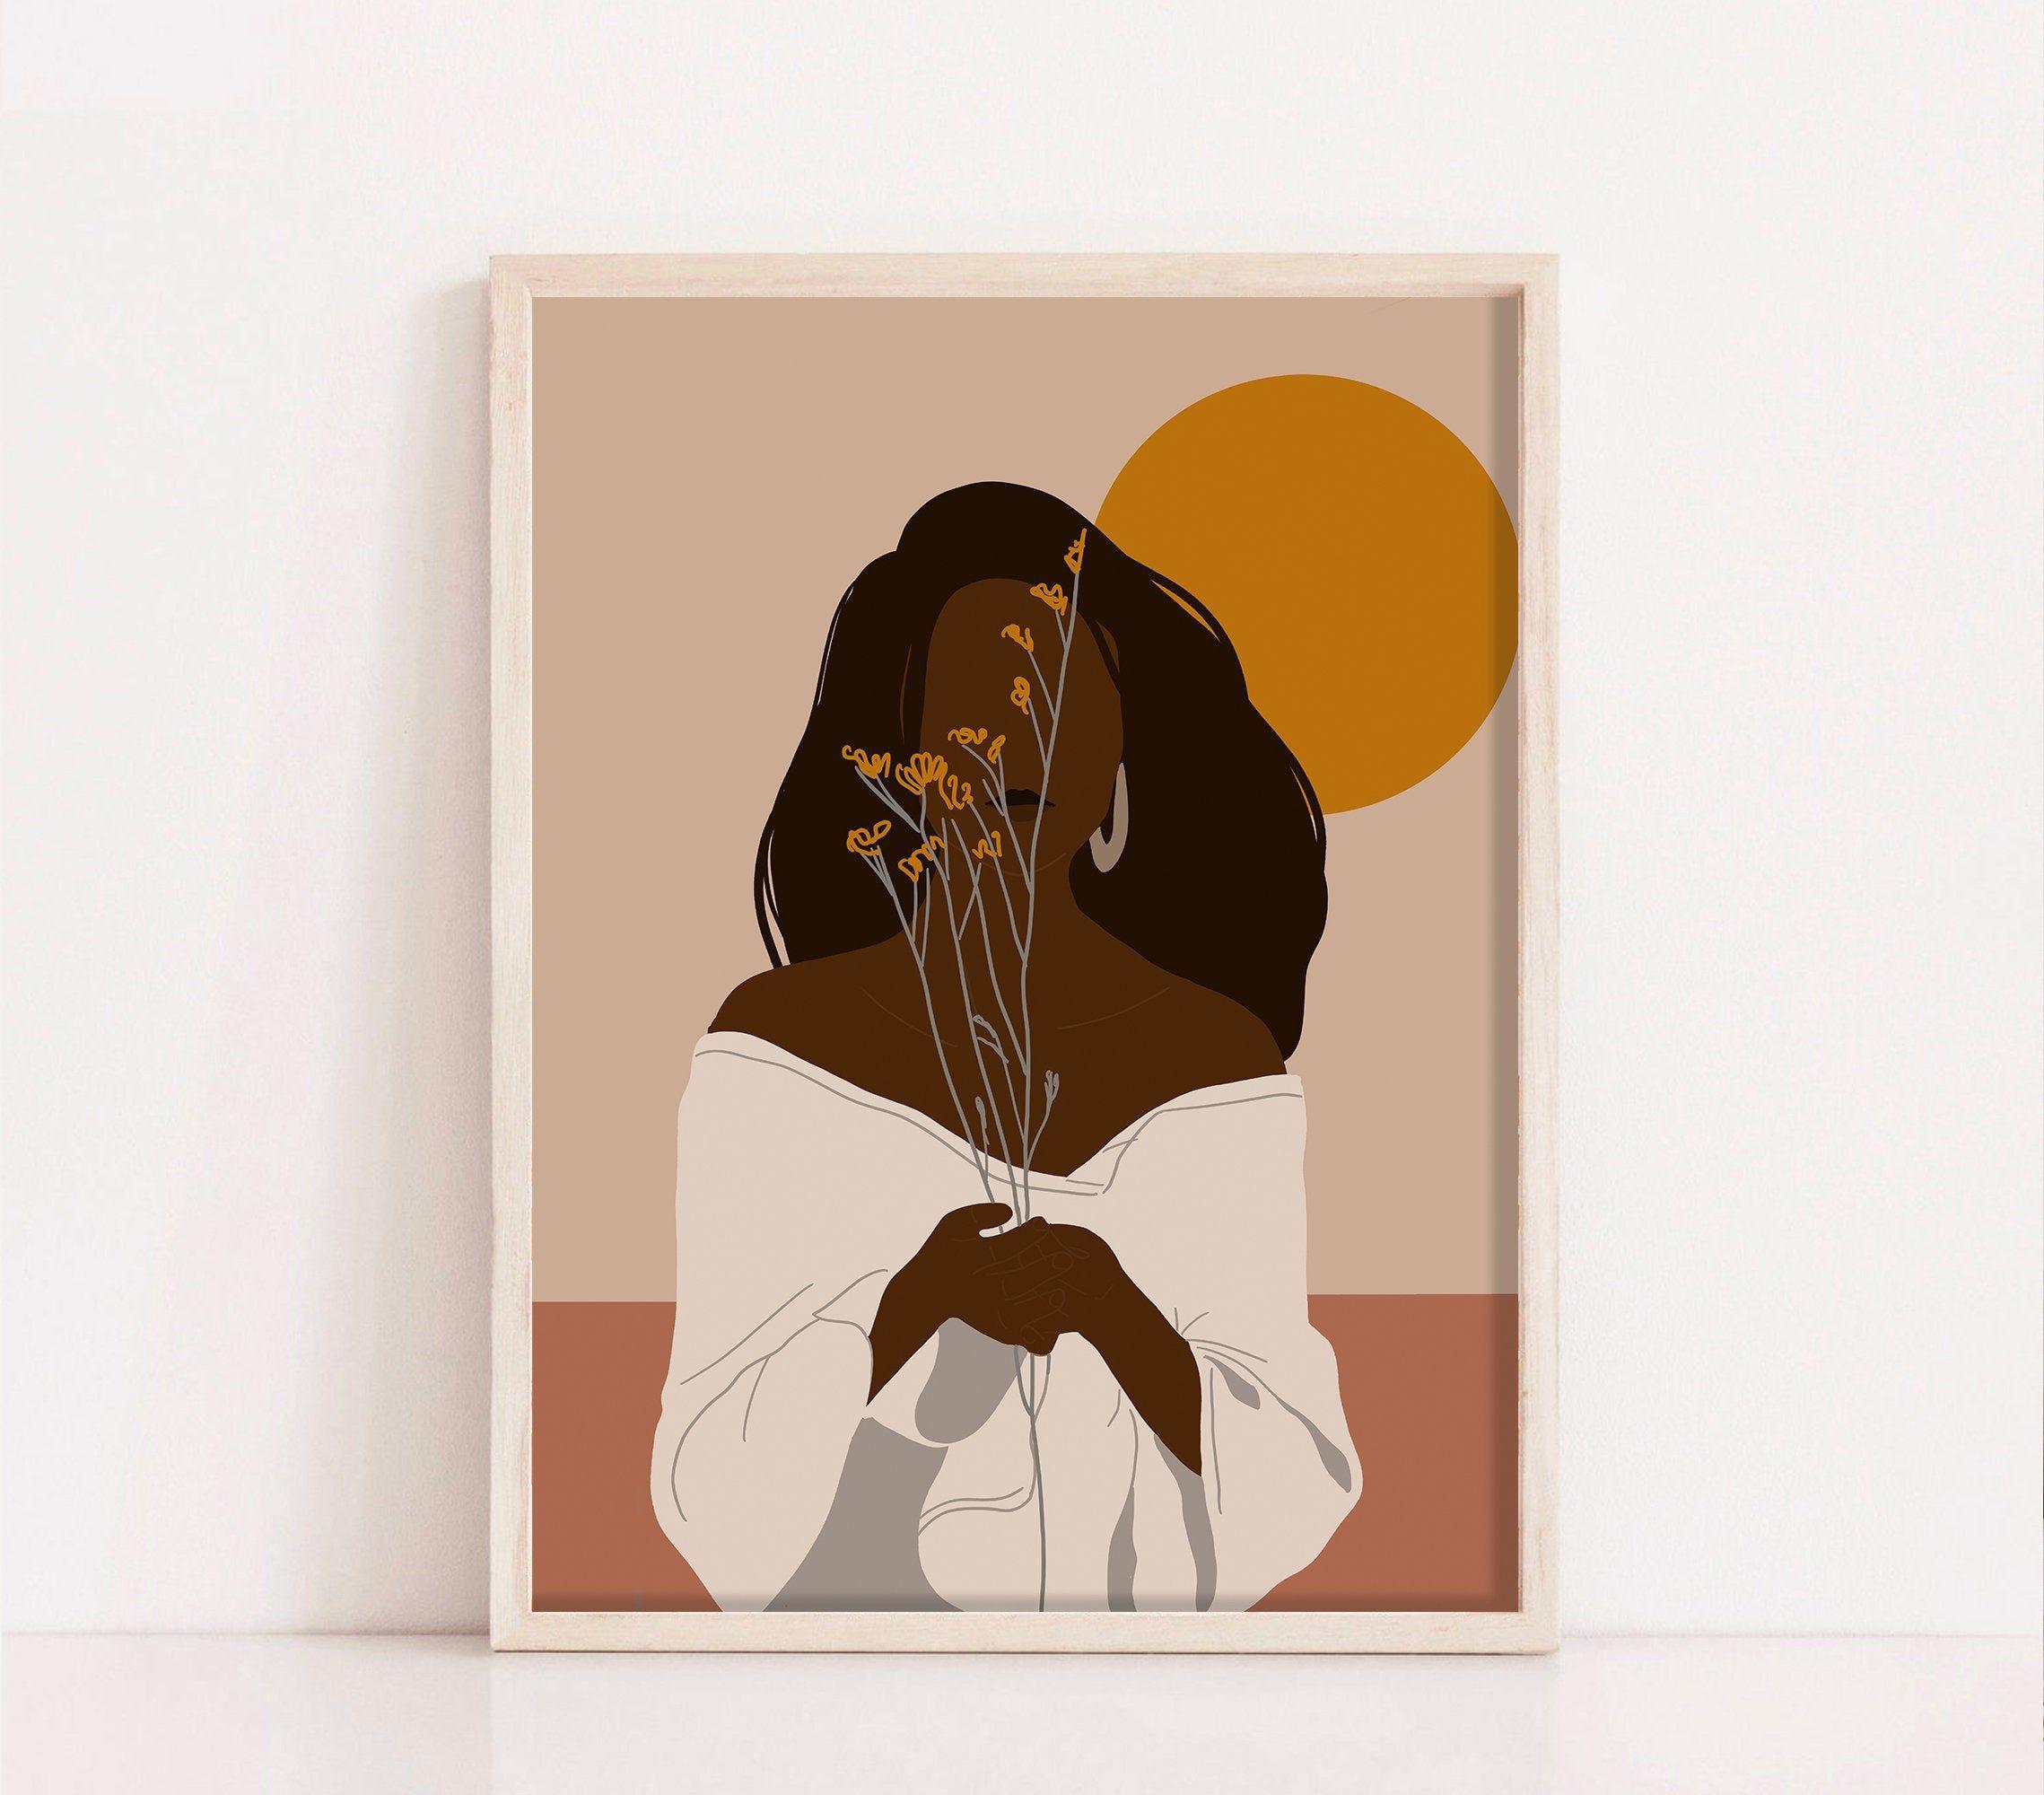 Black Woman Abstract Art African Woman Art Print Mid Etsy African American Art African Women Art American Art